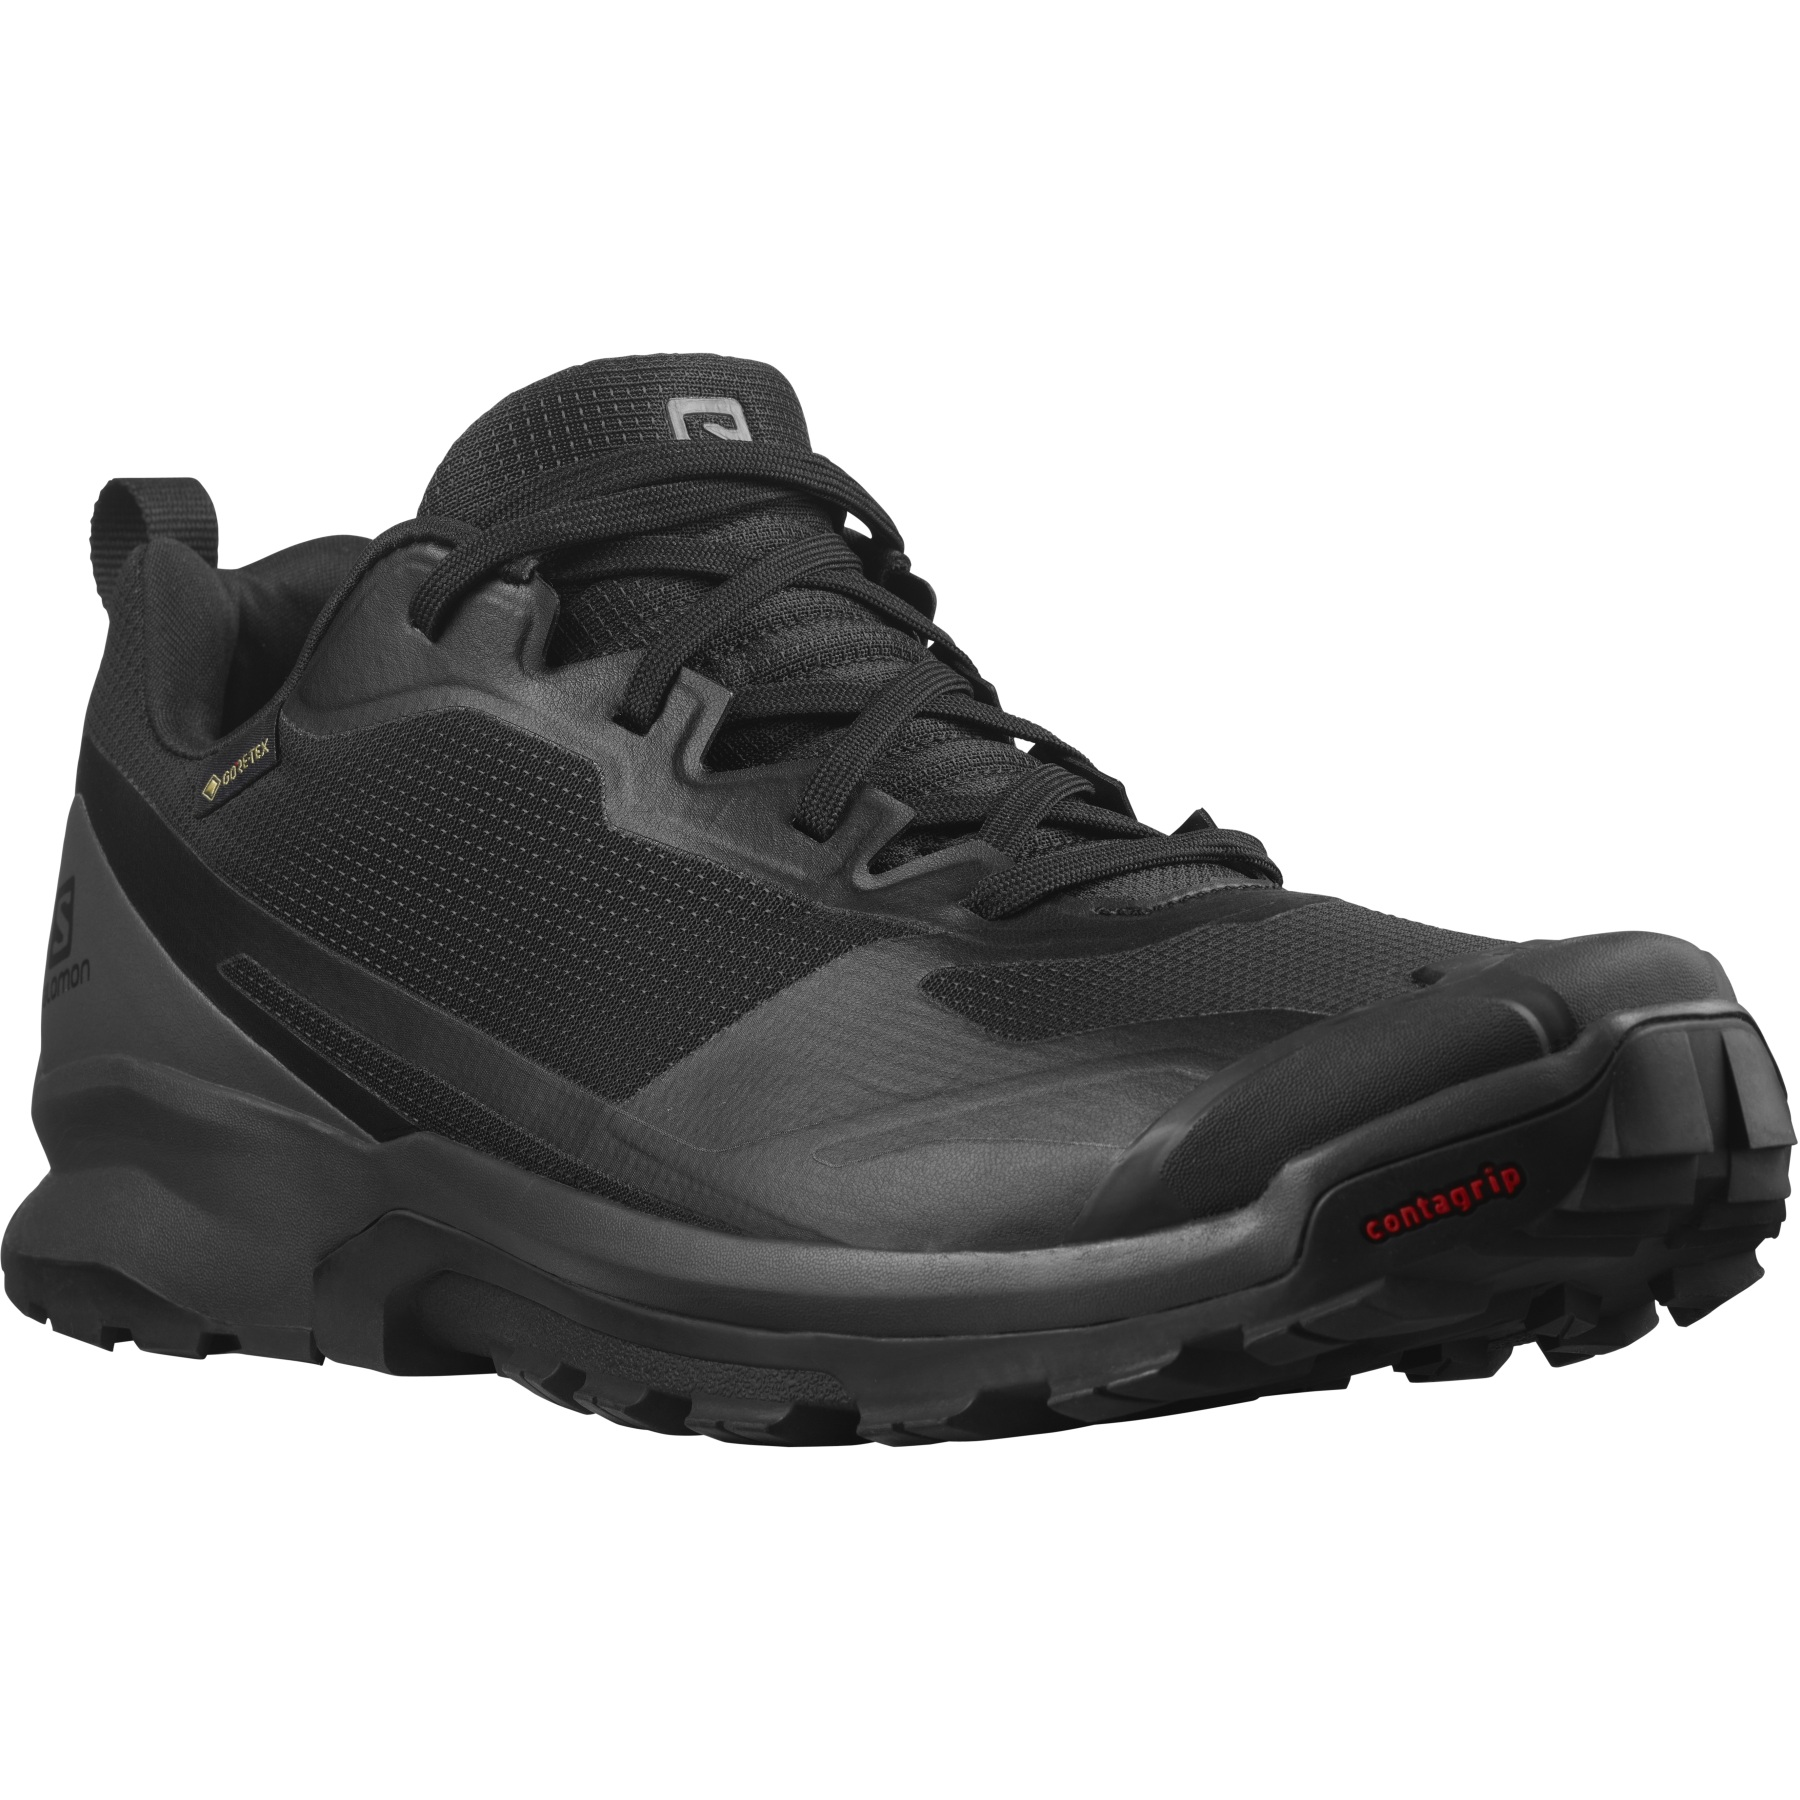 Produktbild von Salomon XA Collider 2 Gore-Tex Trail Laufschuhe - black/black/ebony